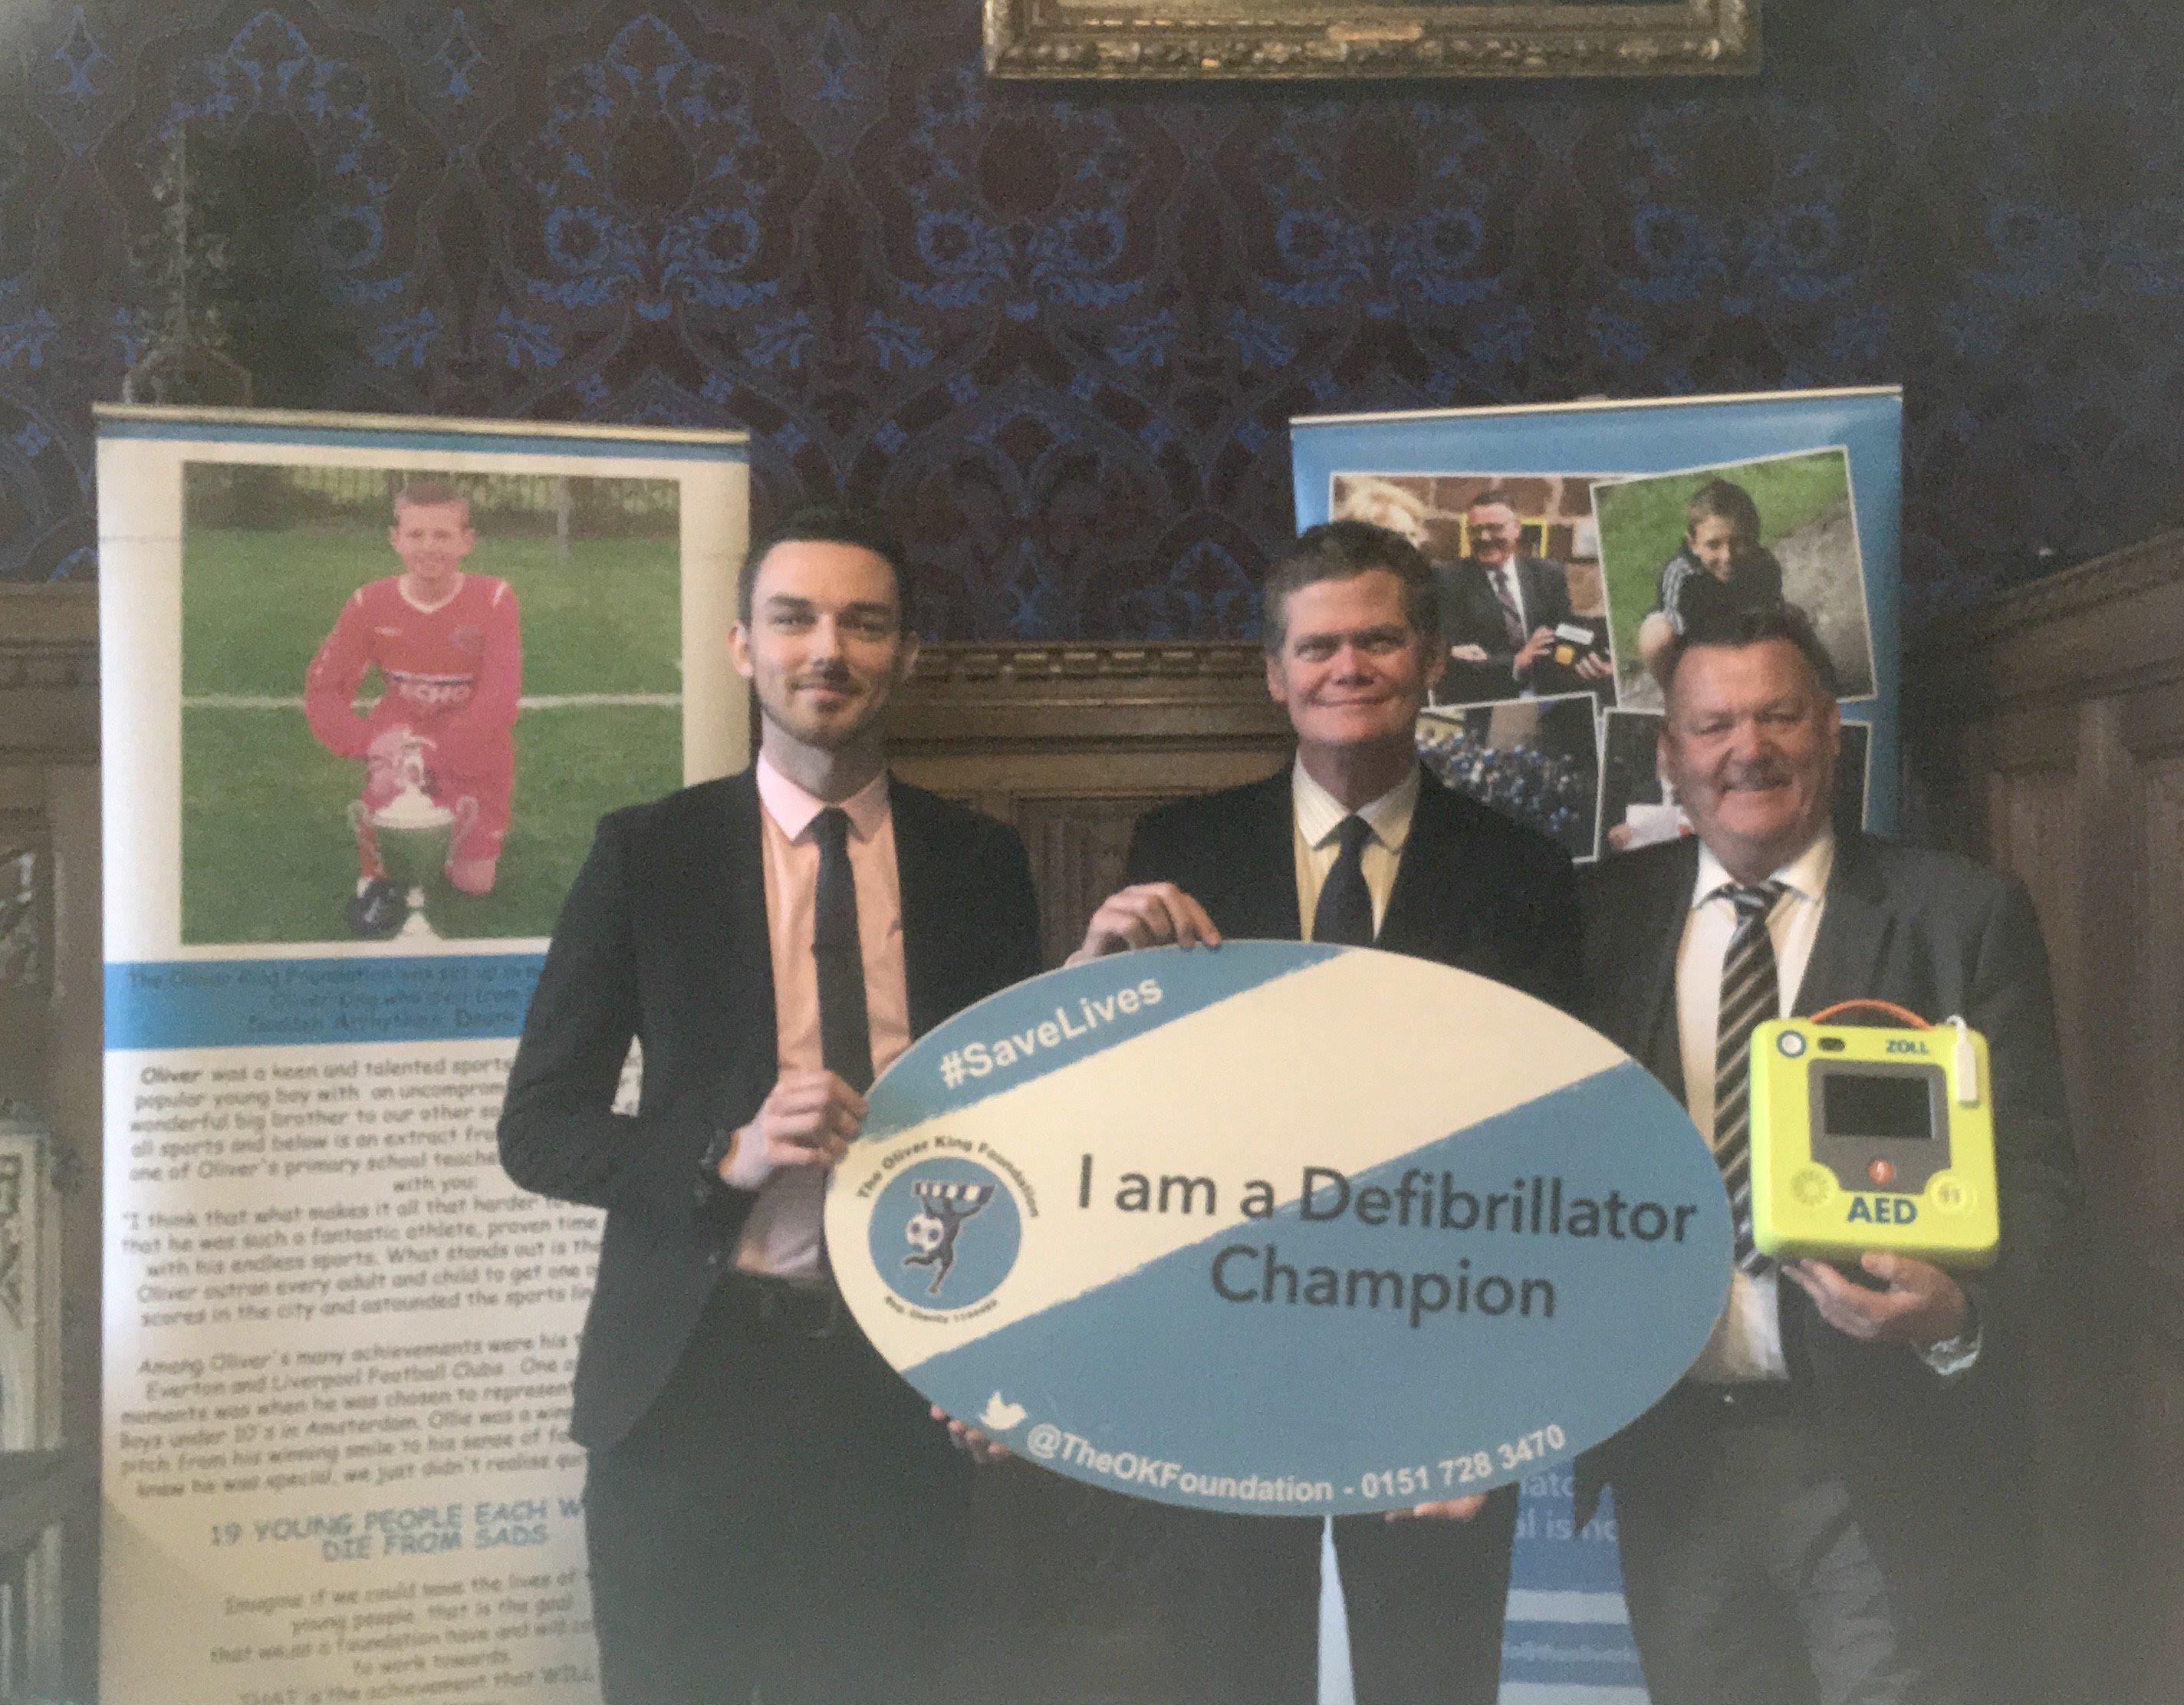 Stephen backs lifesaving defibrillator campaign